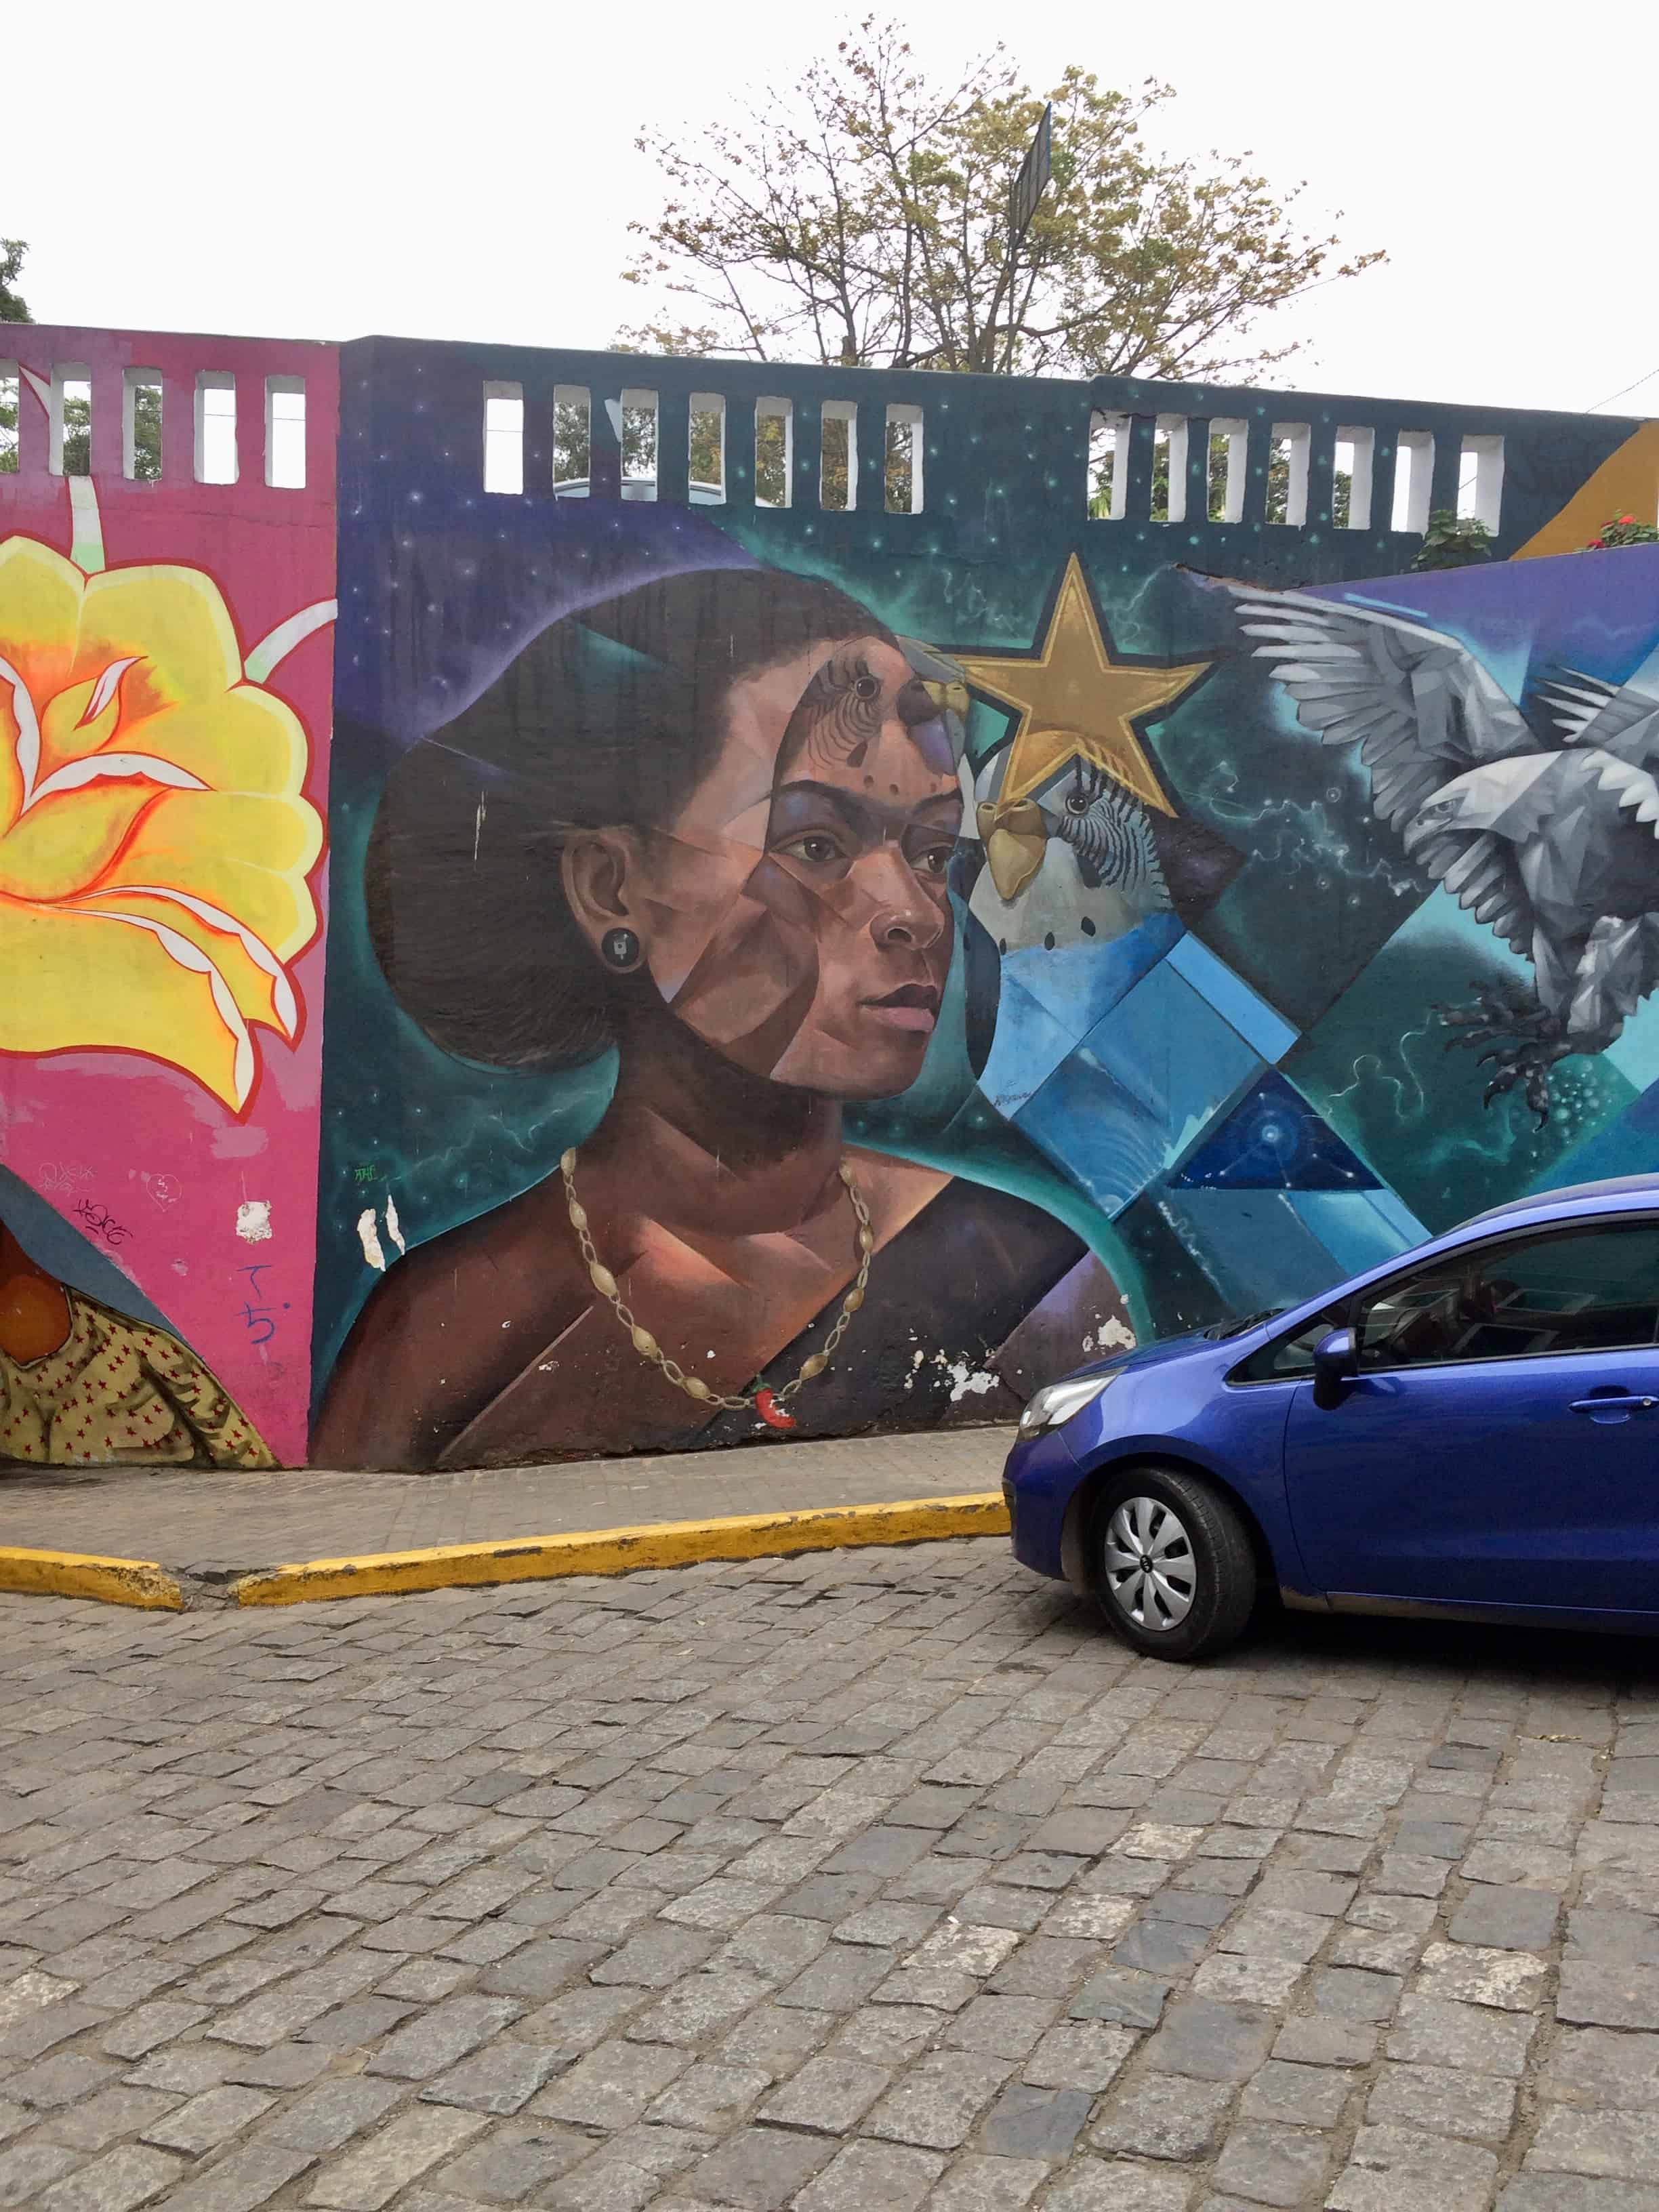 Barranco-miraflores-lima-perou-street art